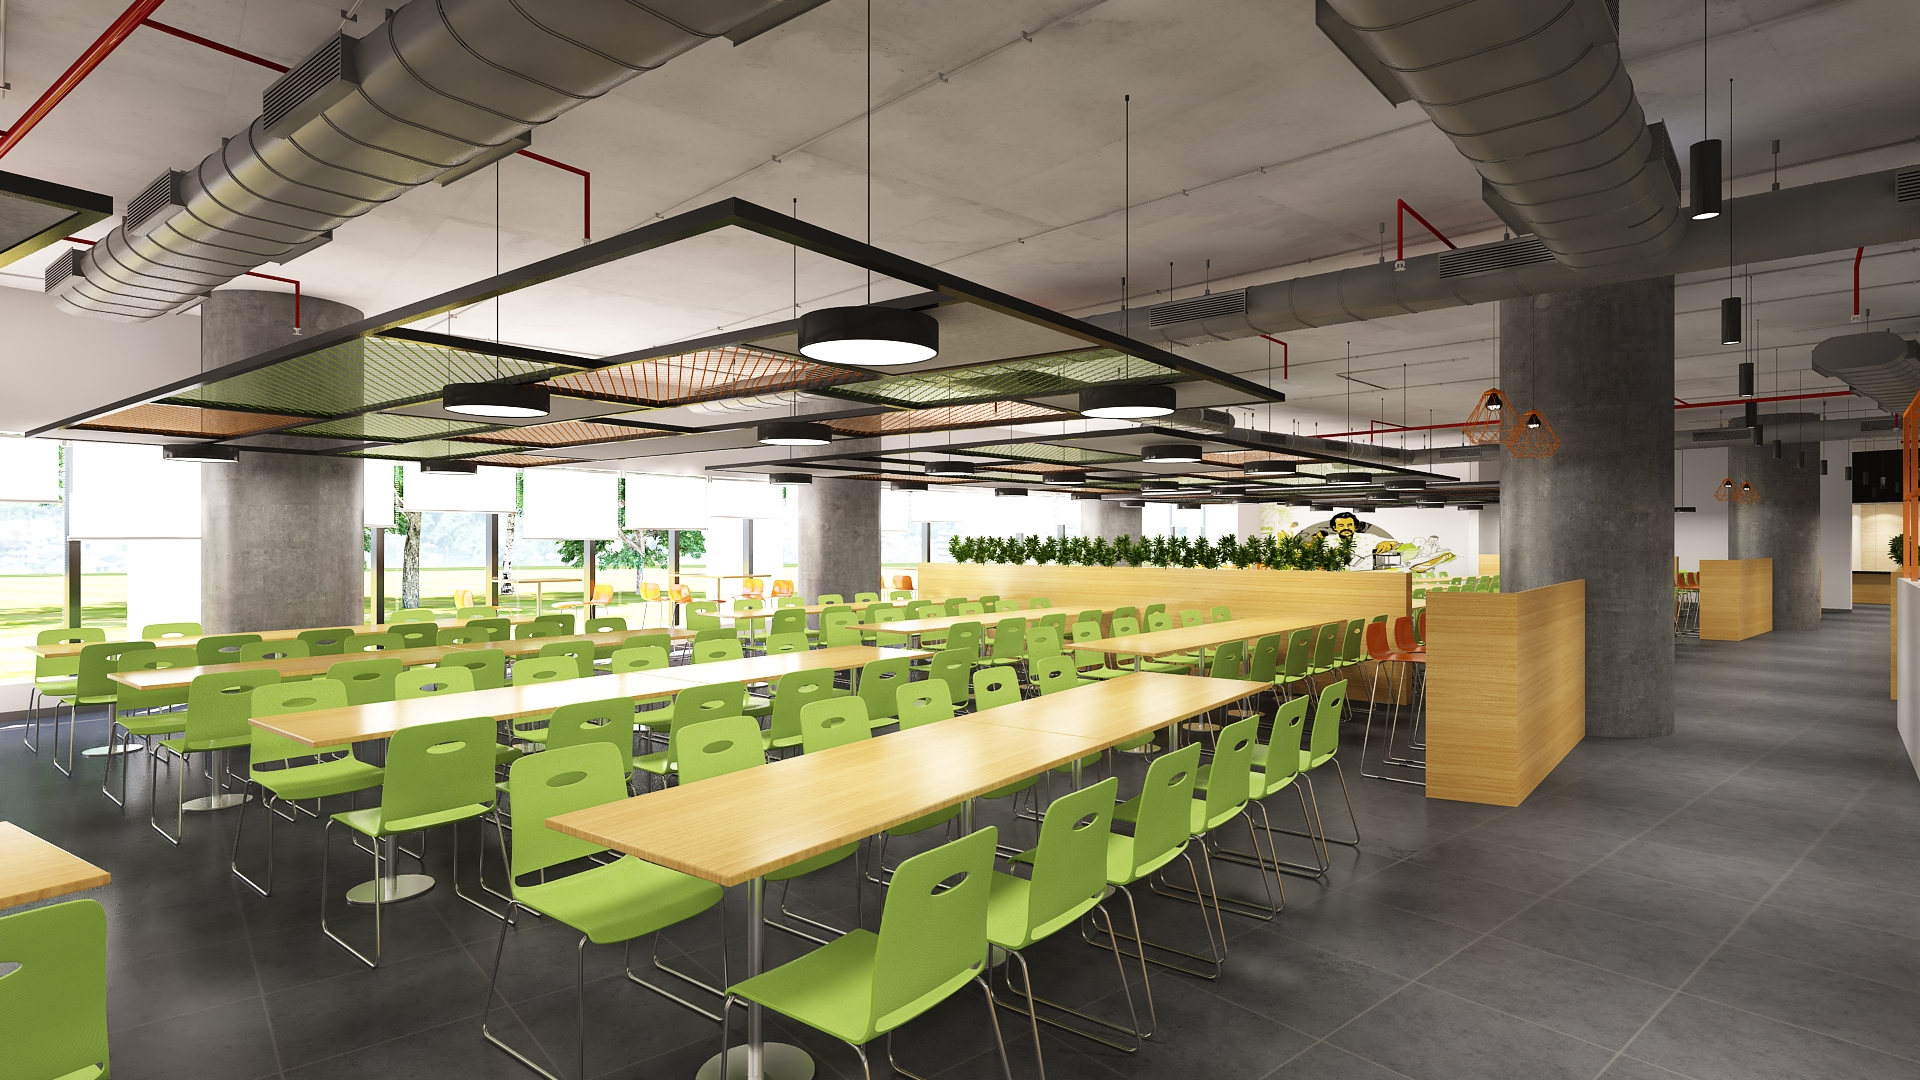 Indoor_Cafe_R1.4